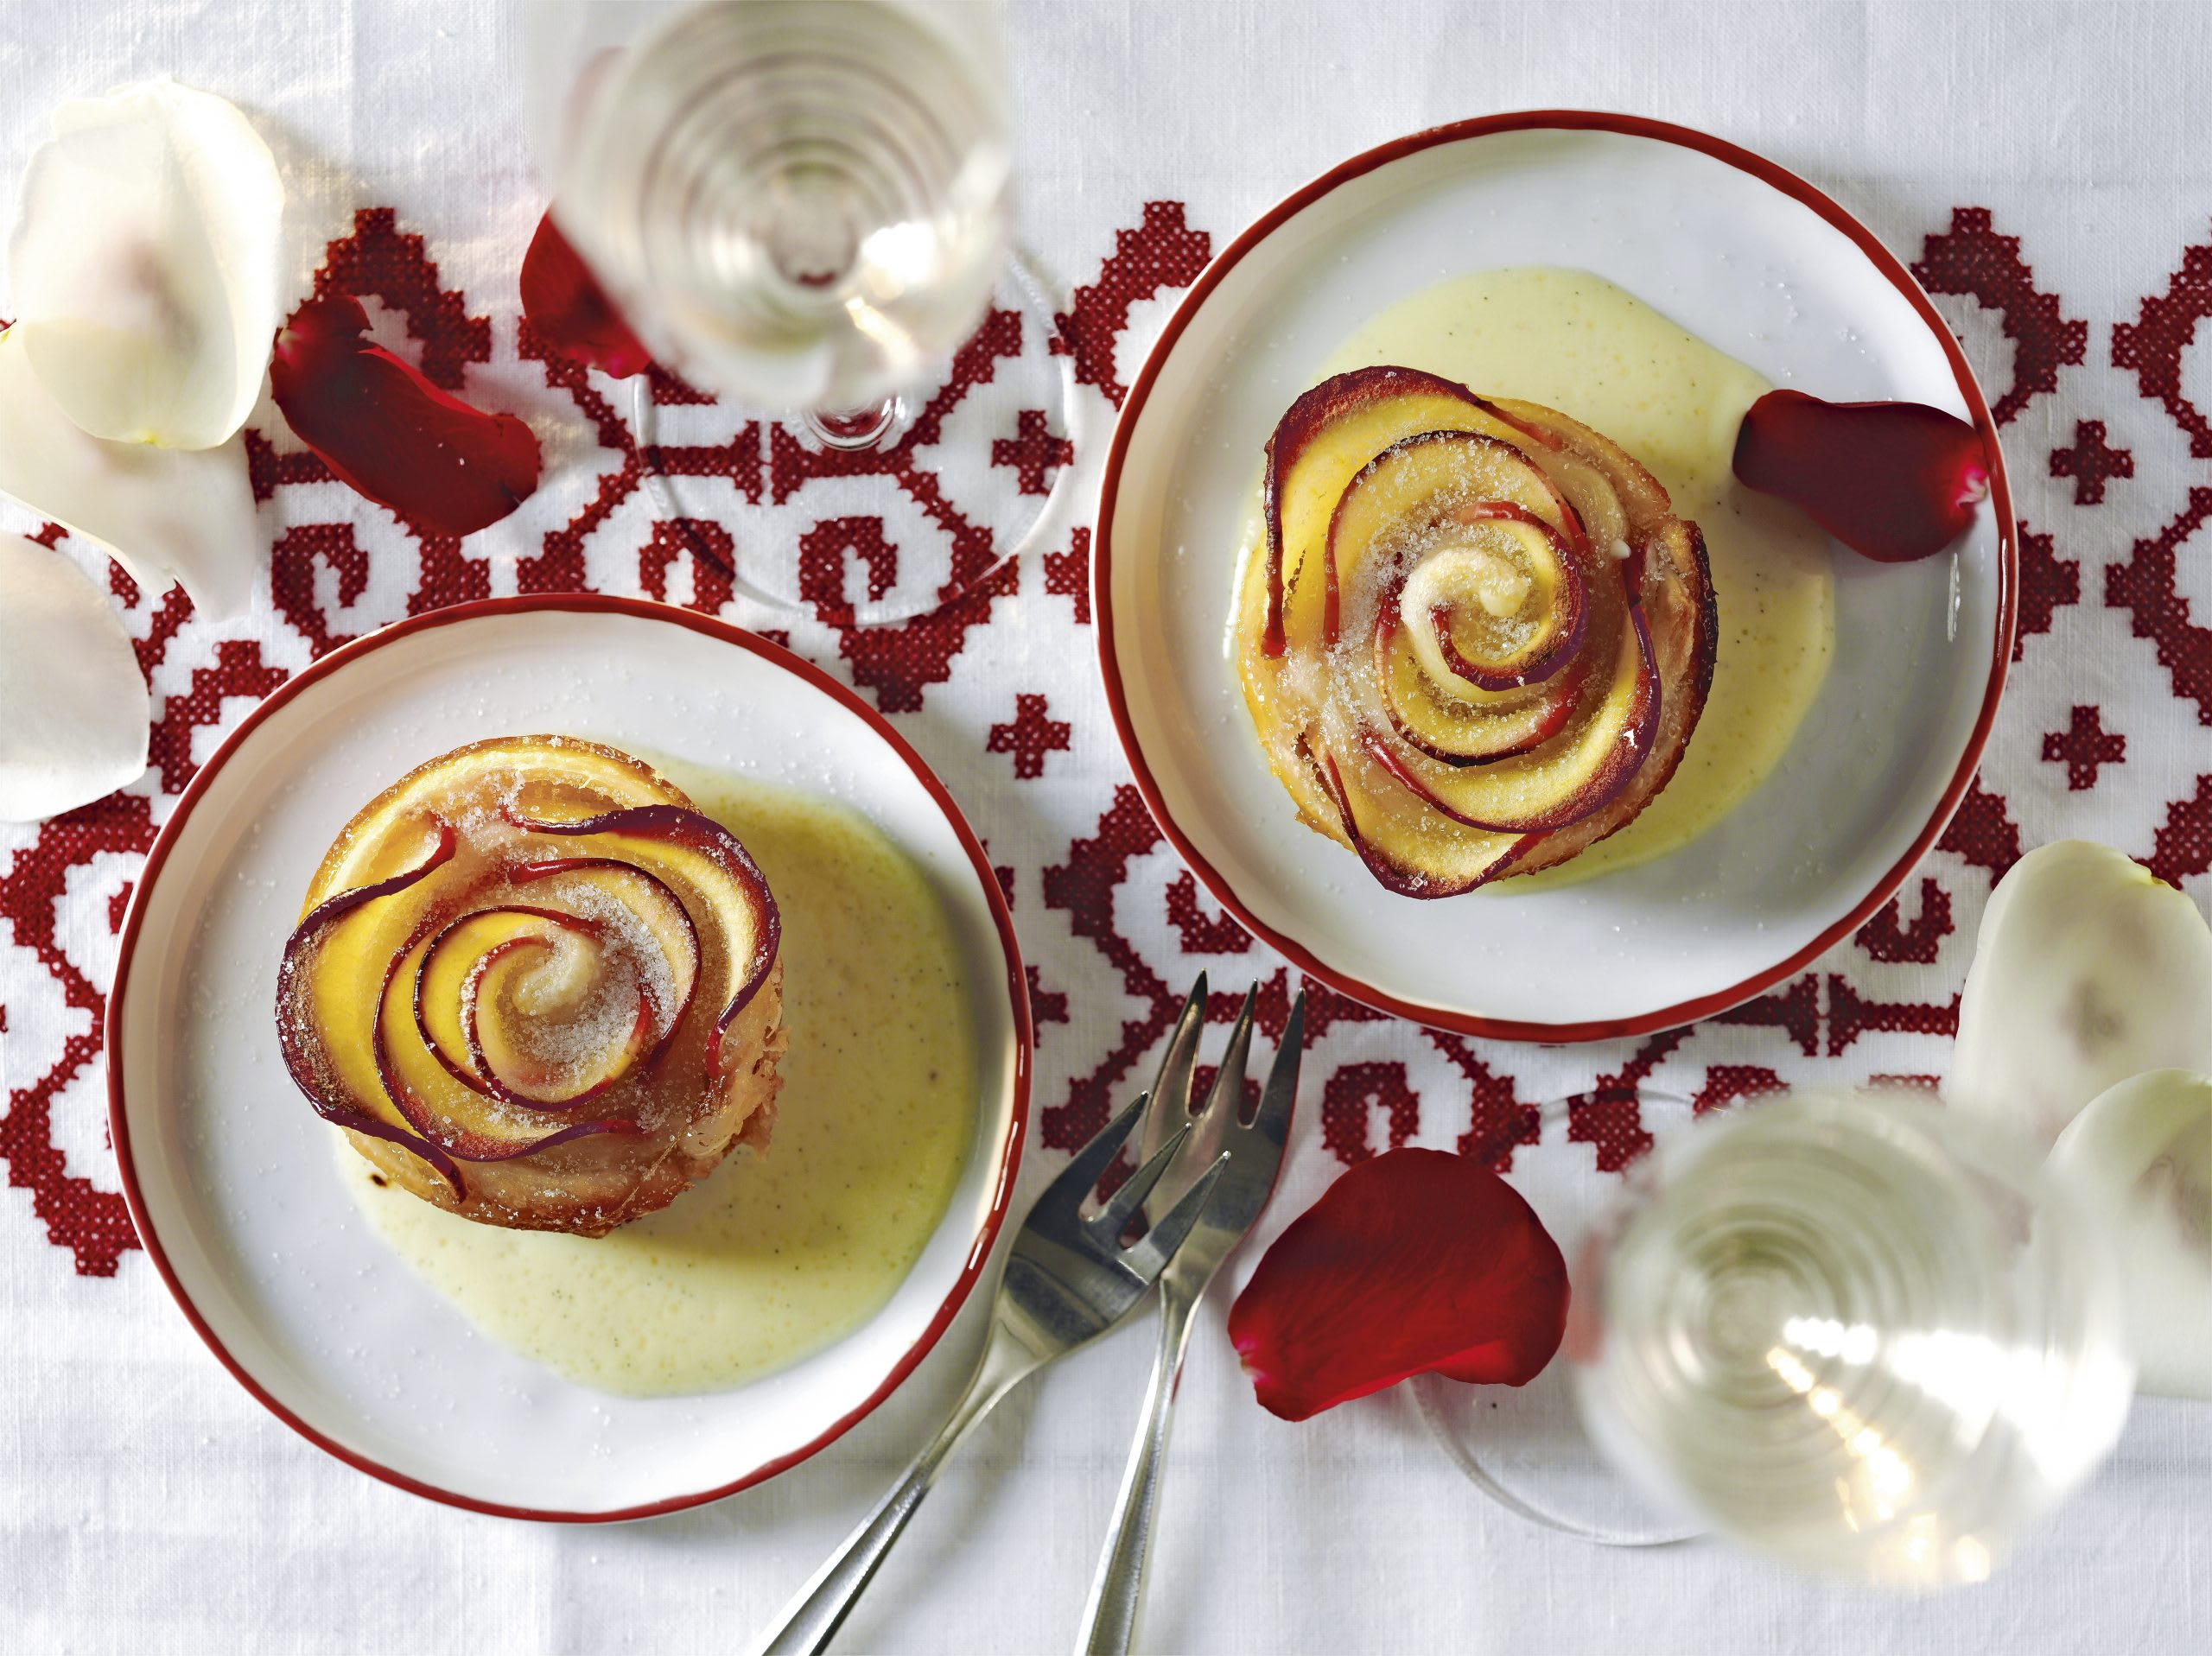 Apfel-Rosen mit Vanillesauce